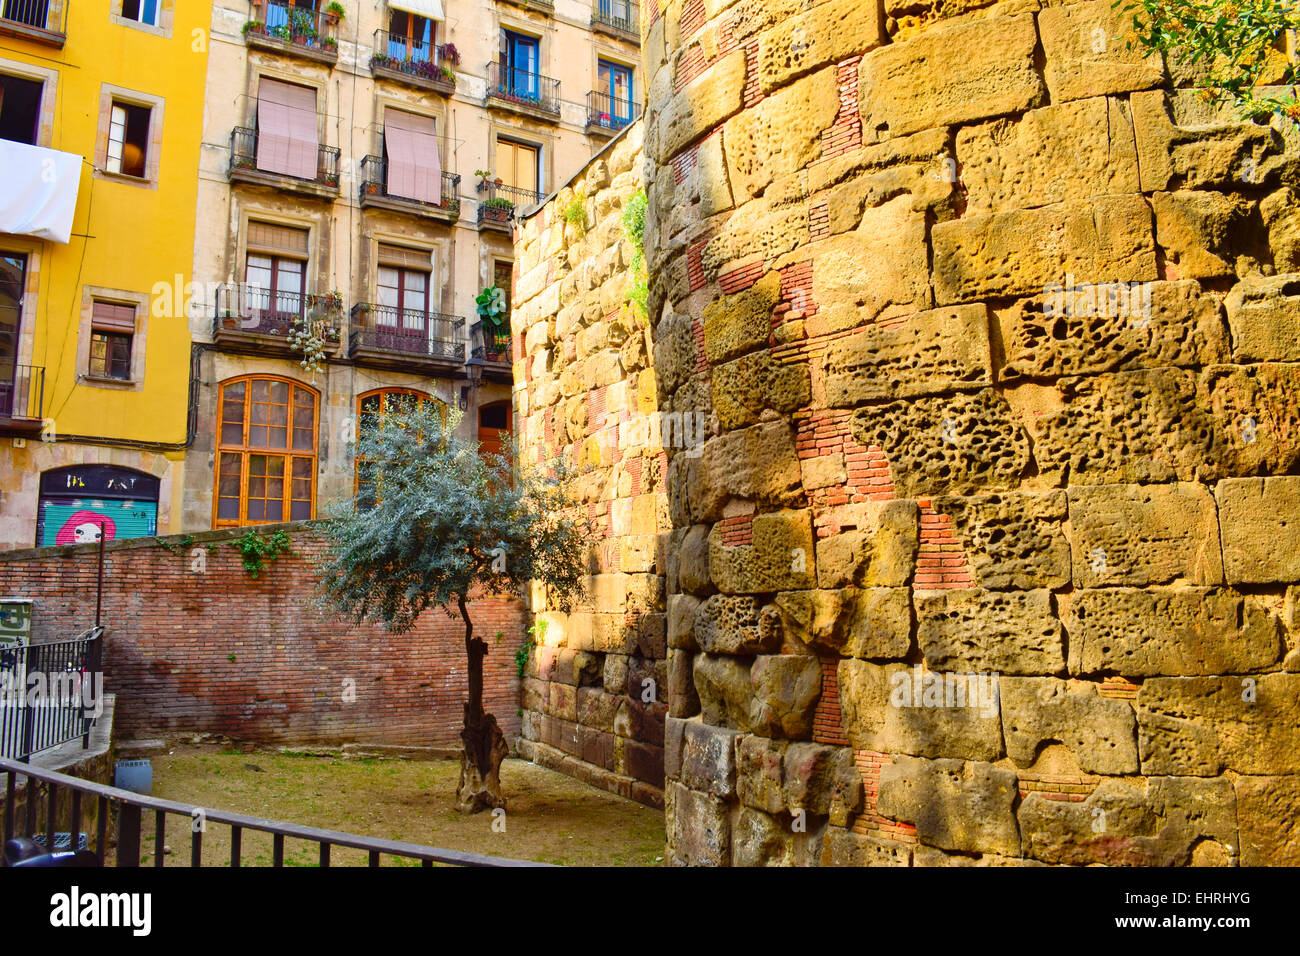 Roman tower. Barcelona, Catalonia, Spain. - Stock Image